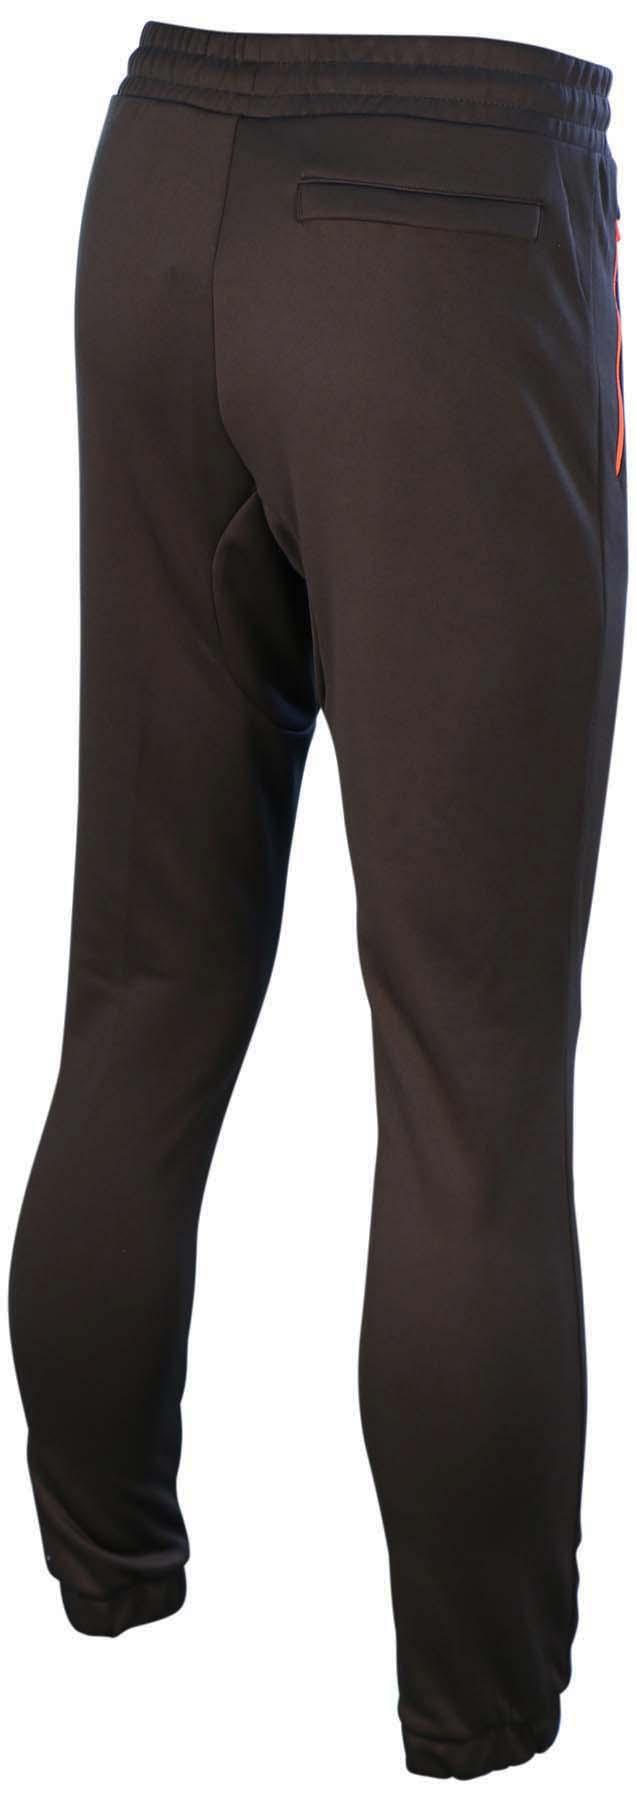 Nike Men's Conversion Poly Knit Sport Casual Pants | eBay